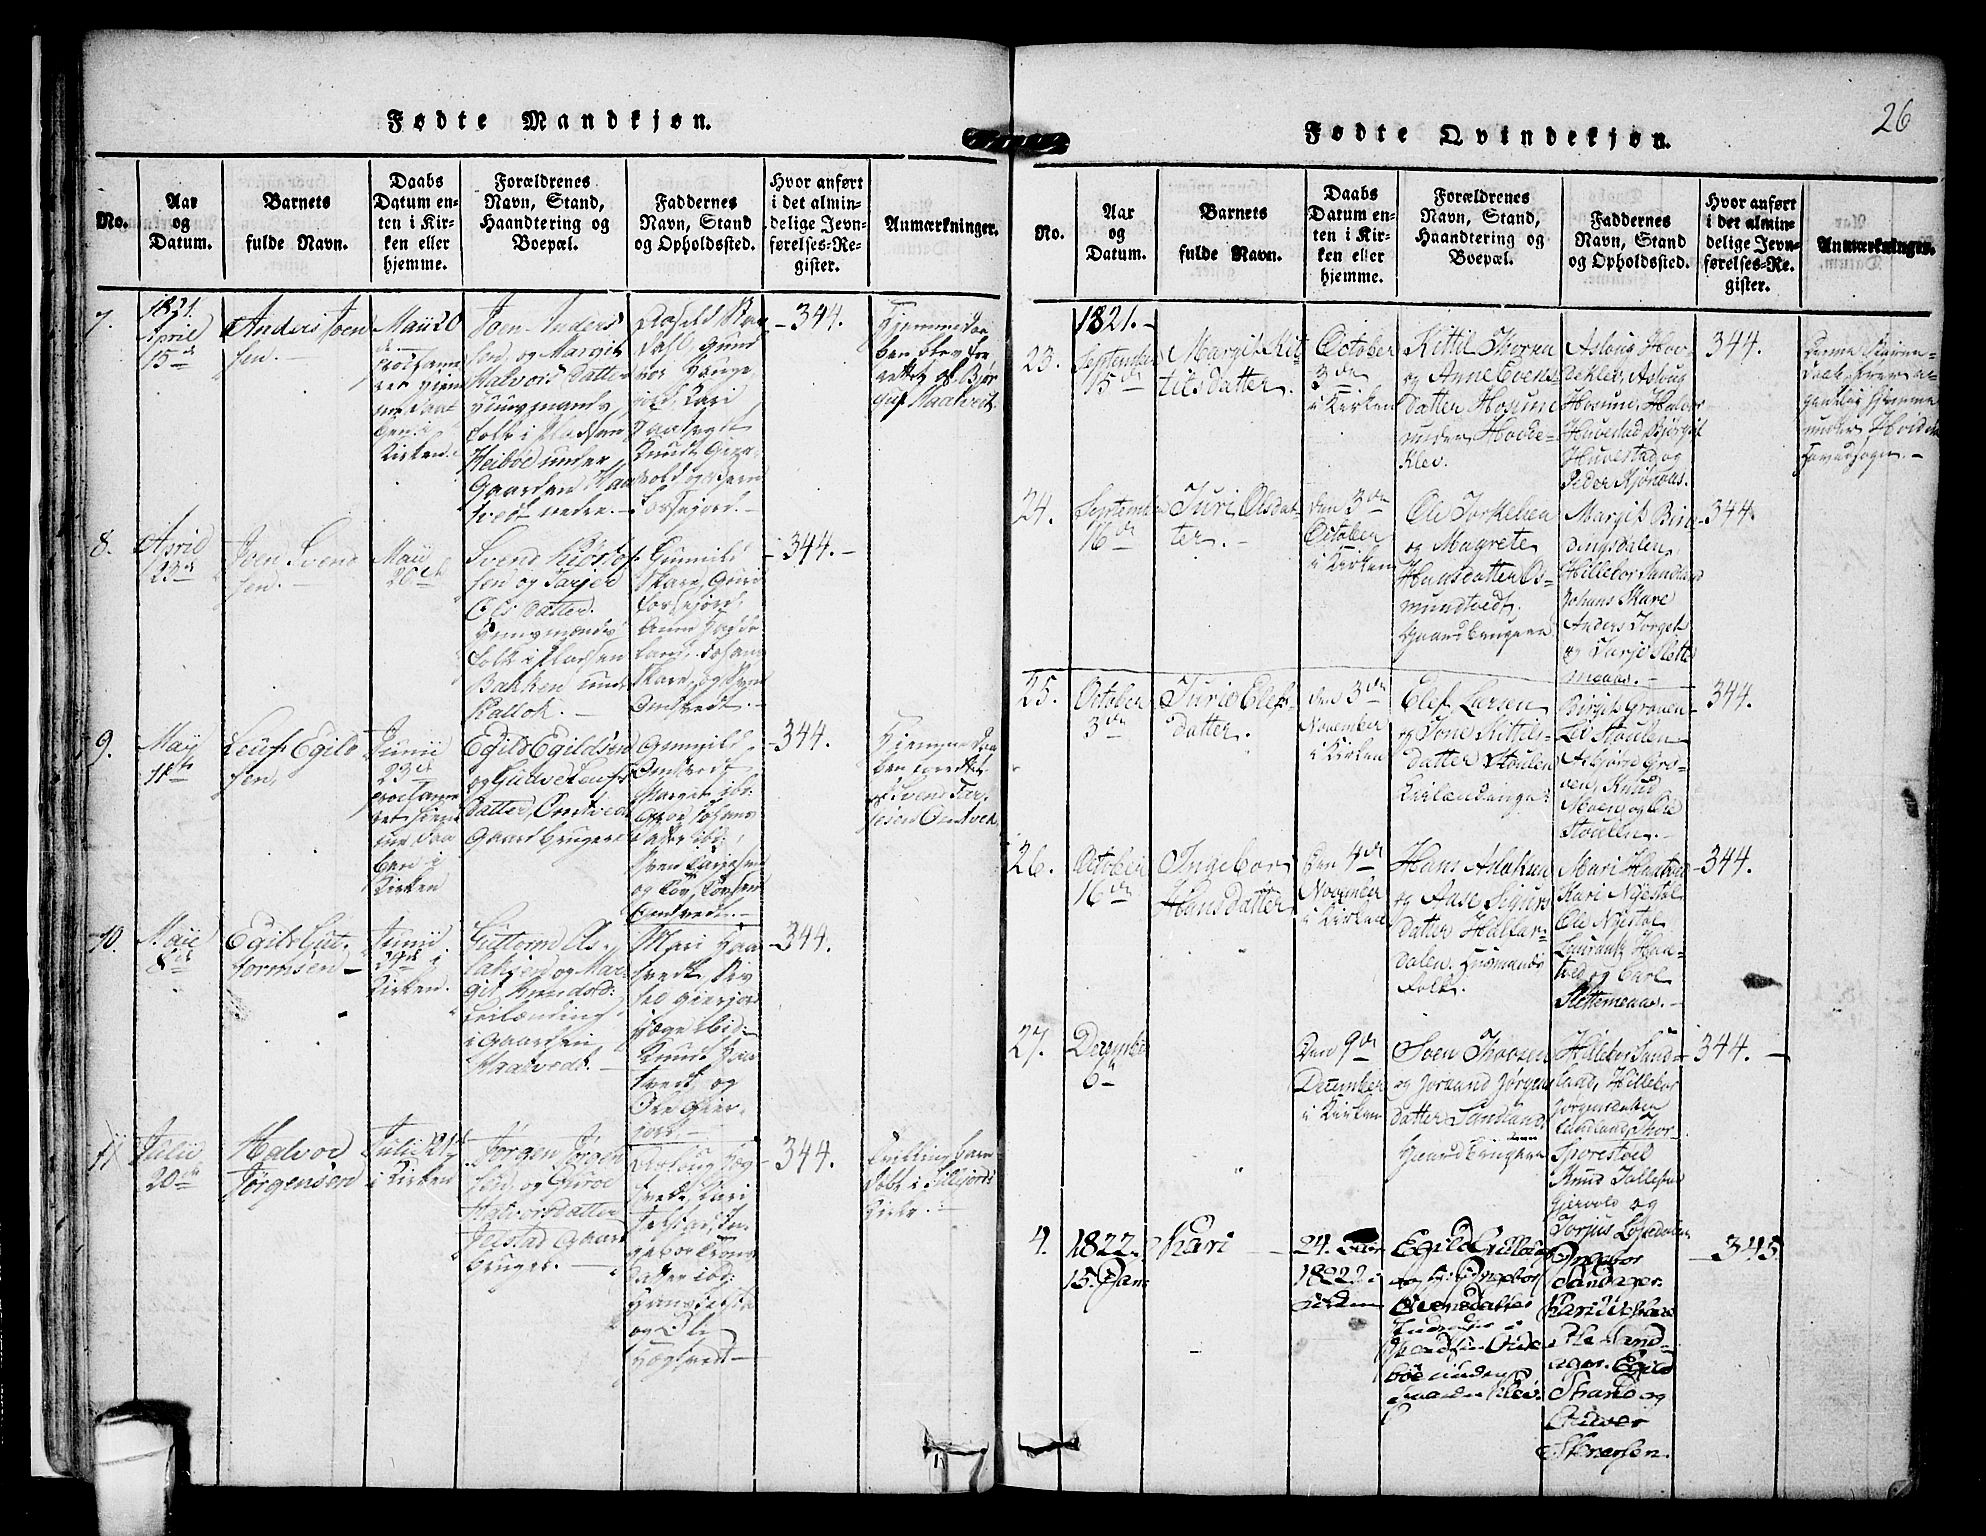 SAKO, Kviteseid kirkebøker, F/Fb/L0001: Ministerialbok nr. II 1, 1815-1836, s. 26